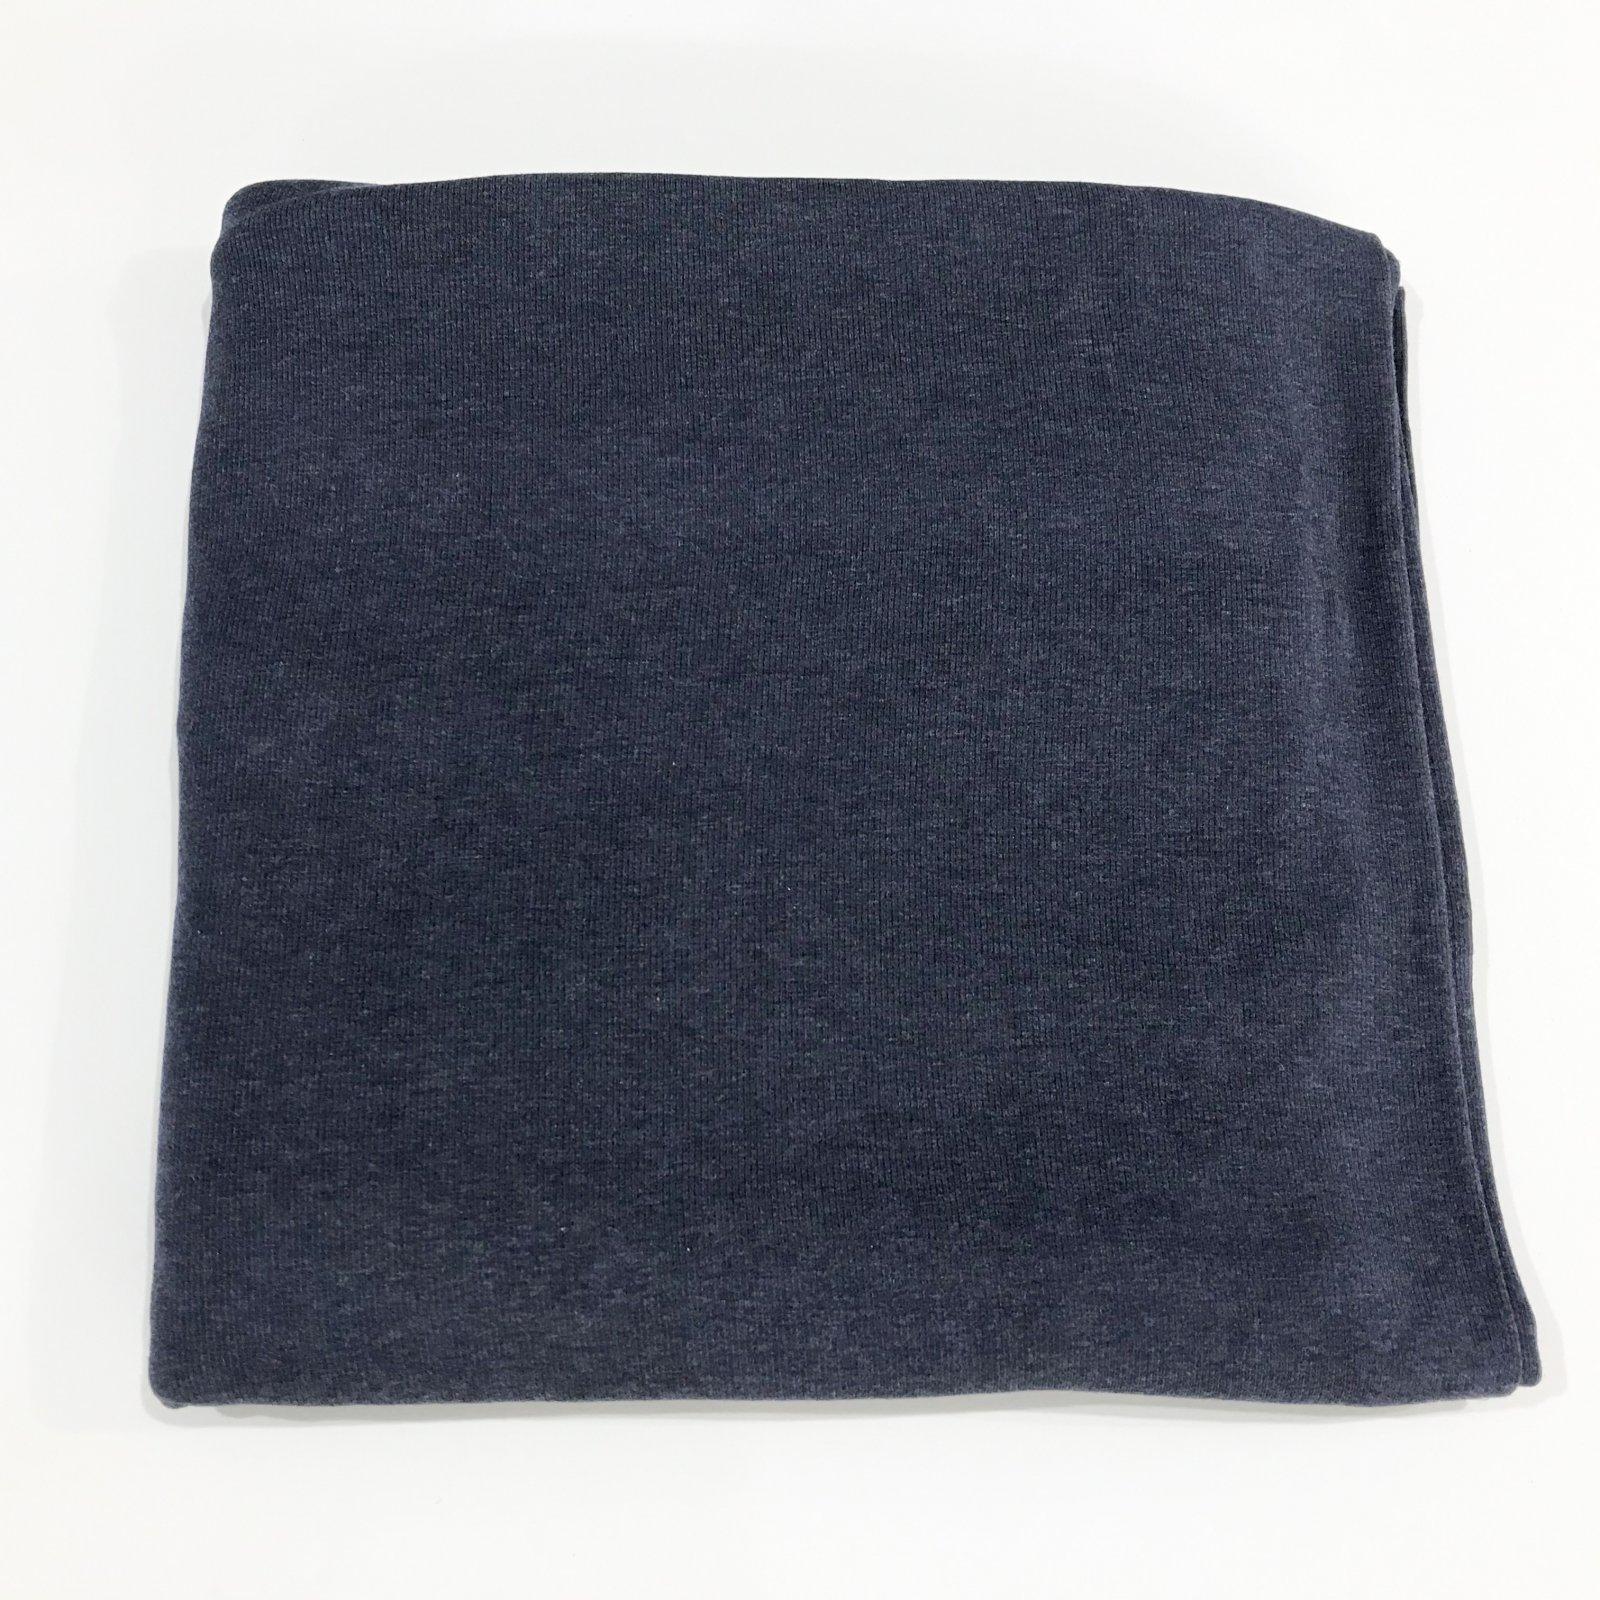 2 yards - Rib Knit - Micro Modal 1 x 1 Rib - Navy Melange